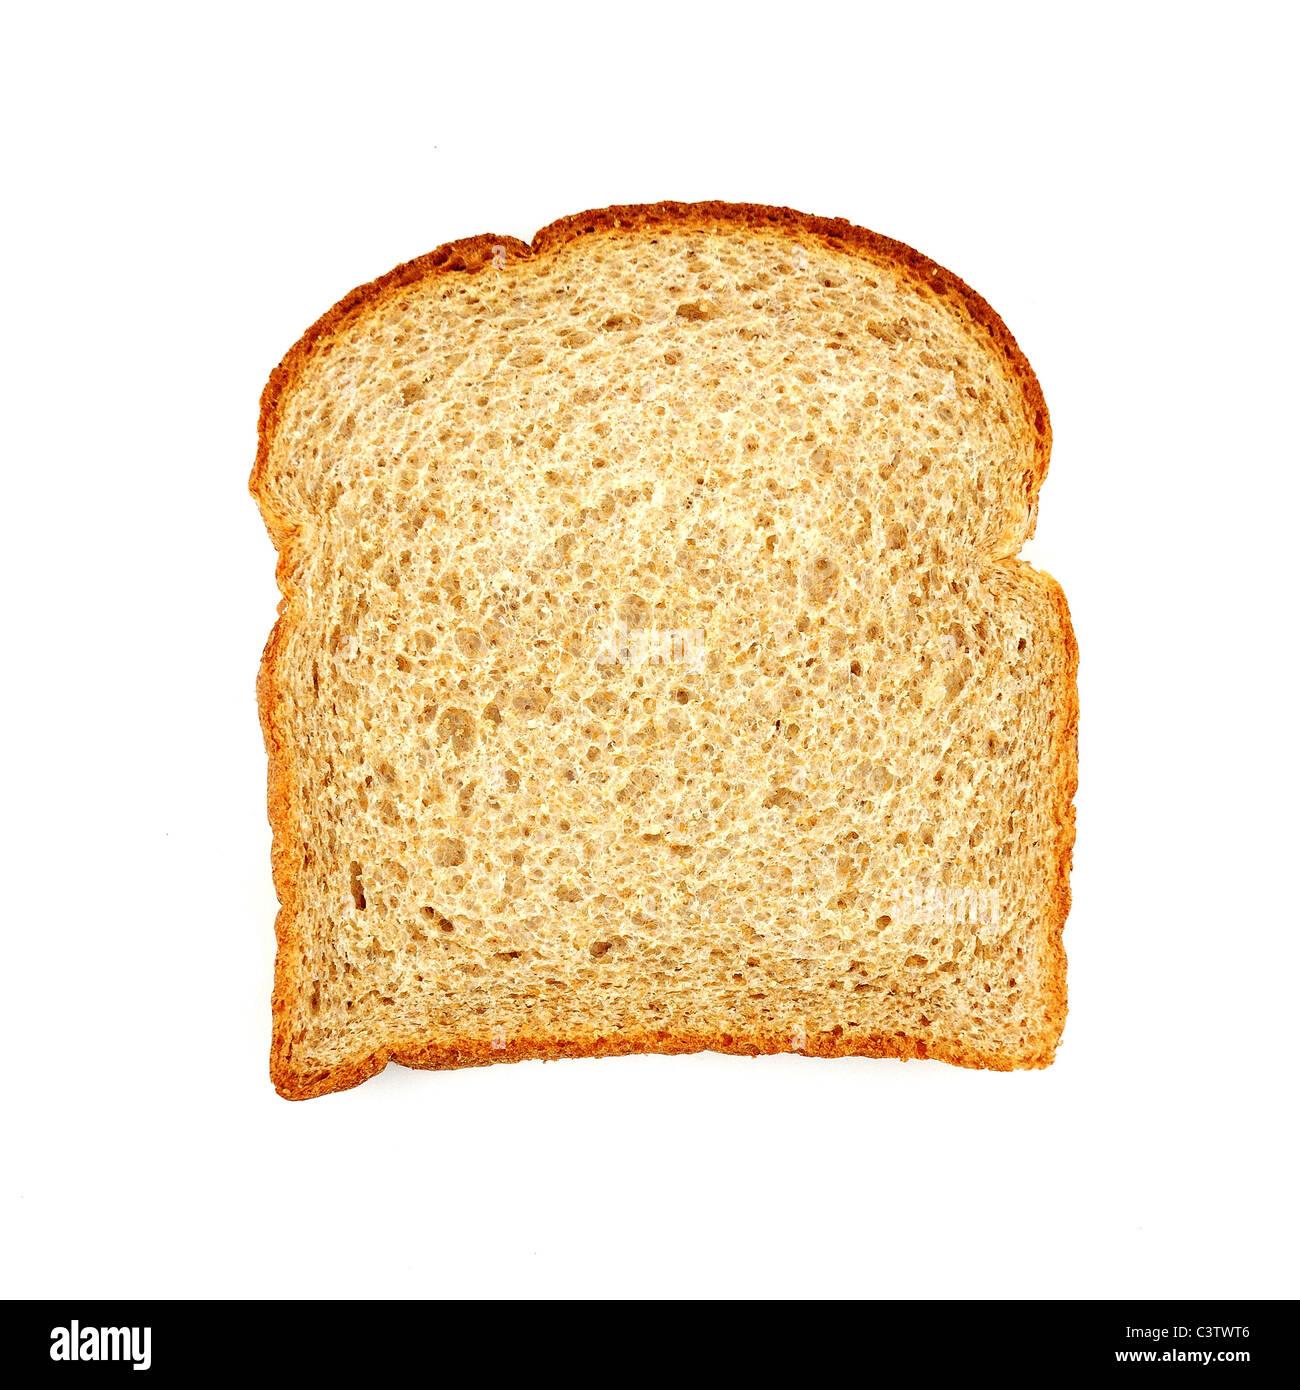 slice of whole wheat bread - Stock Image